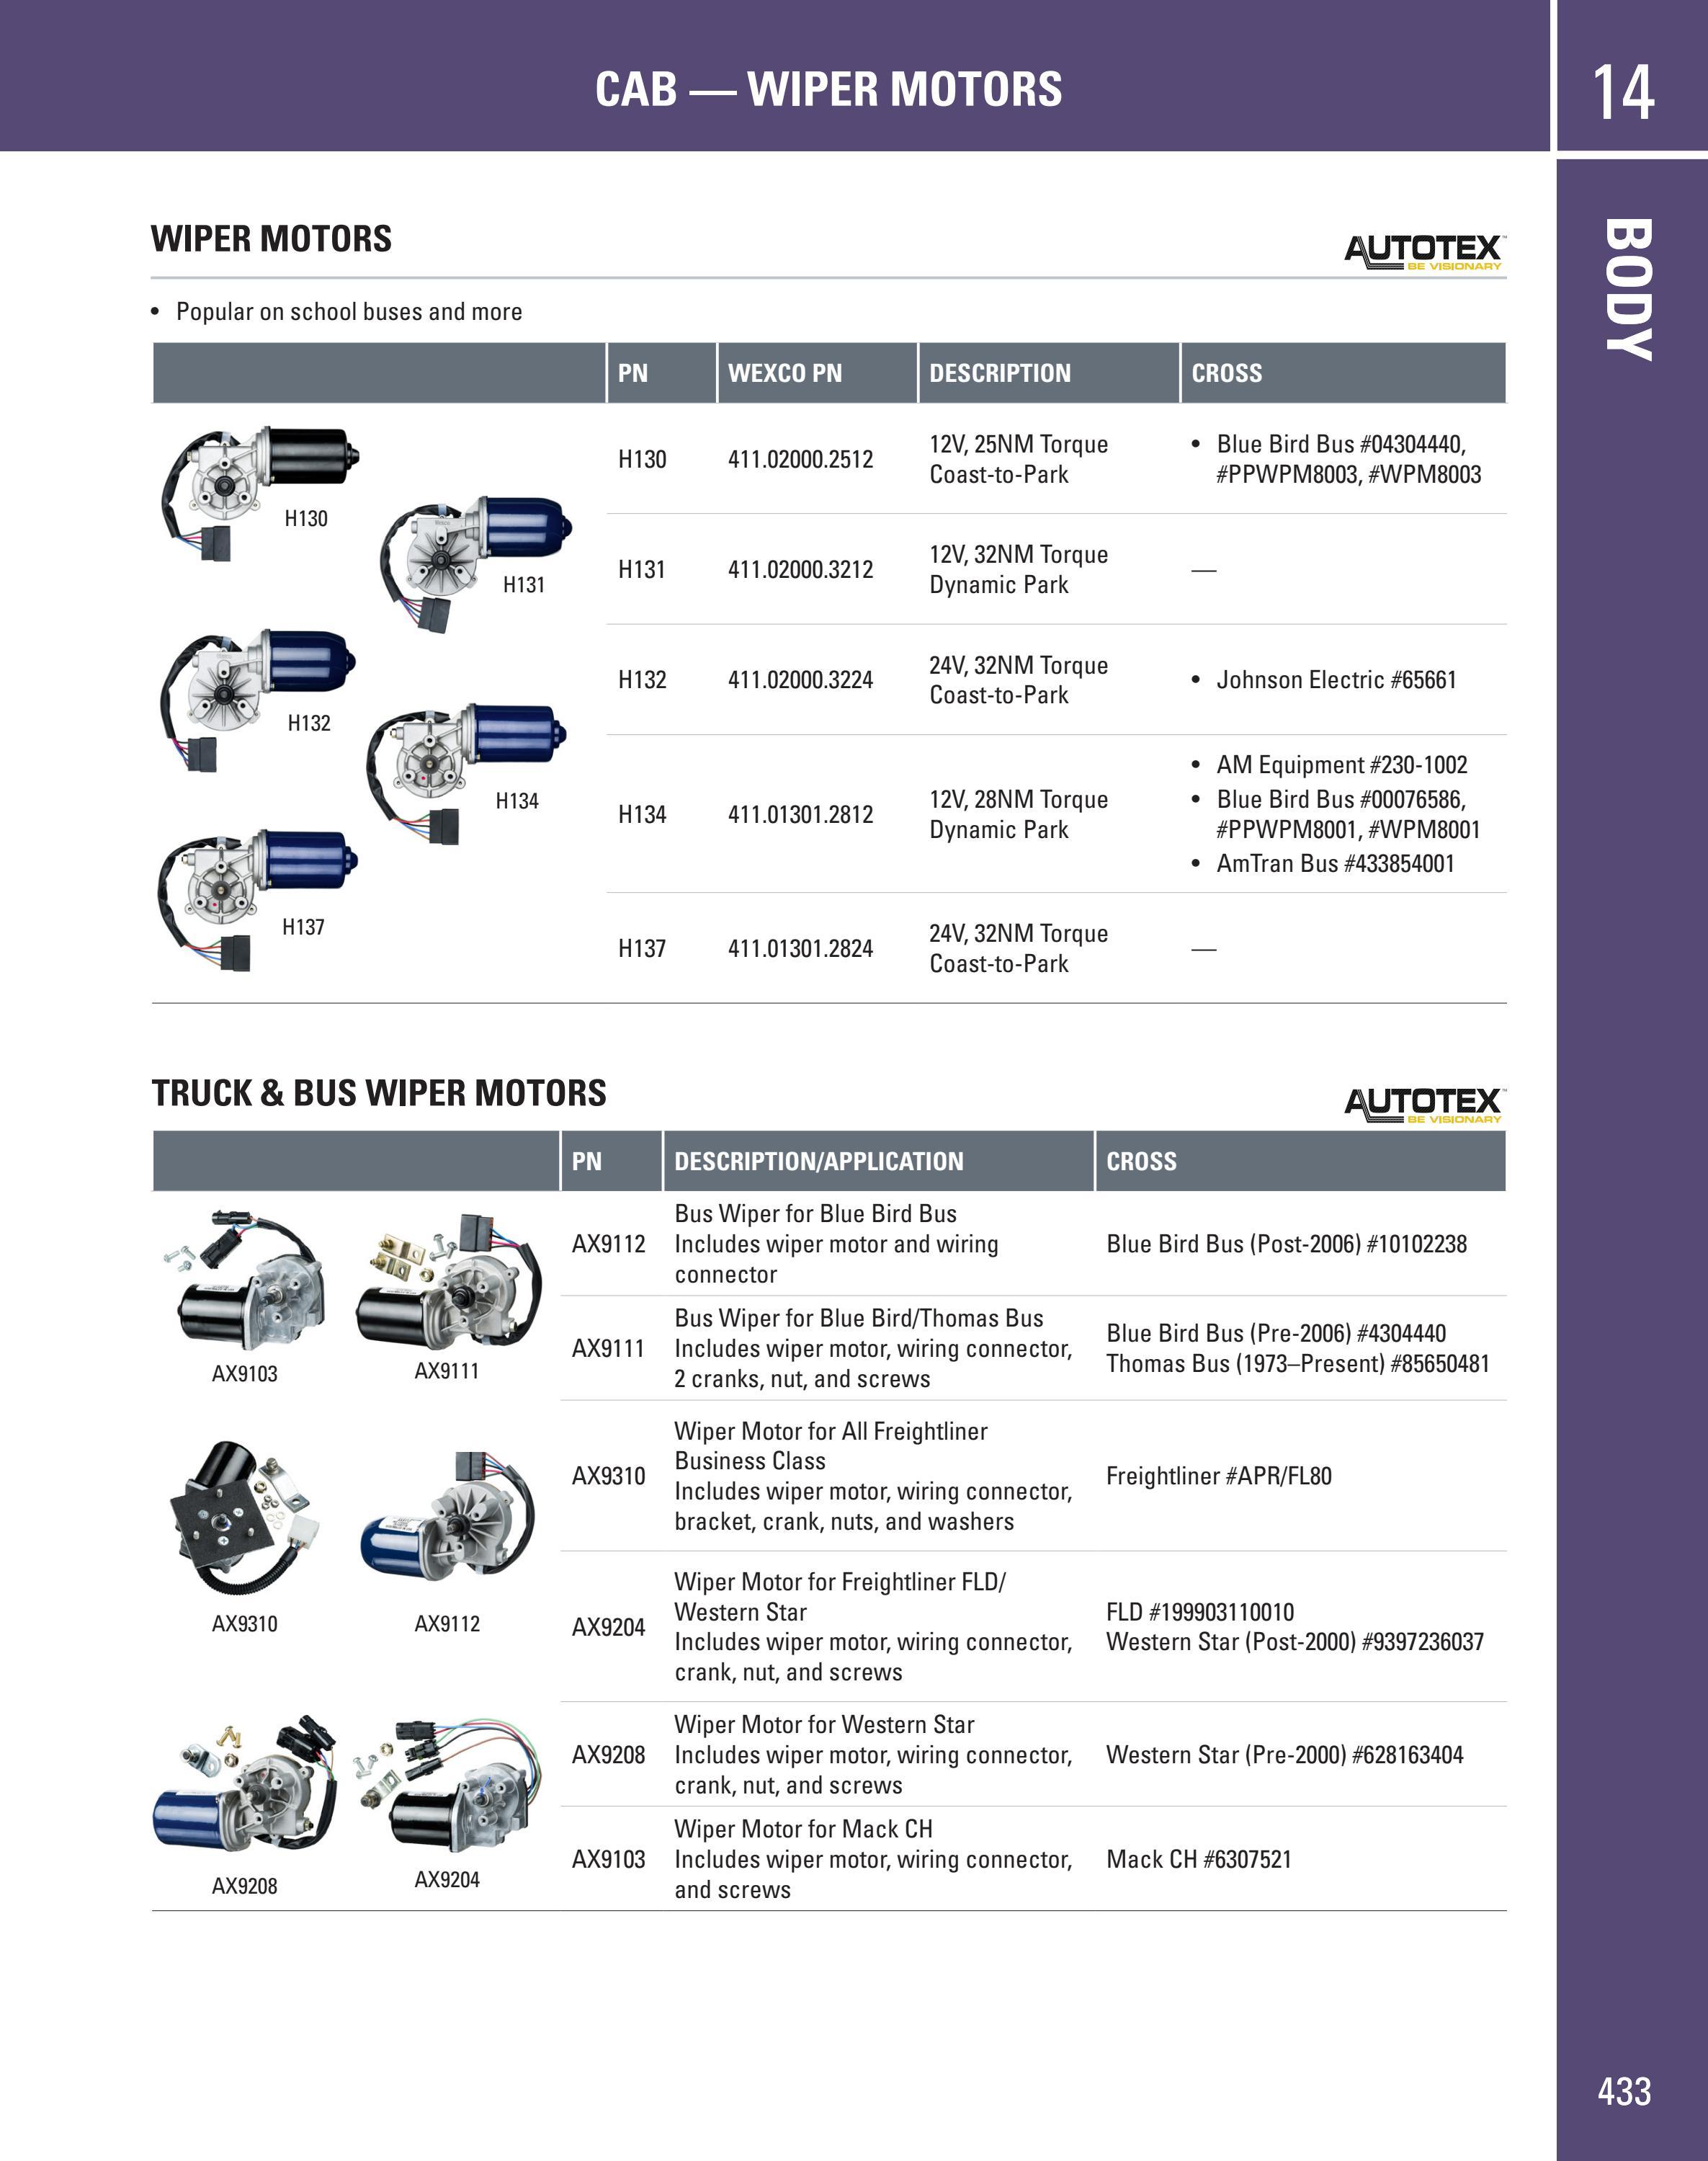 Wexco Wiper Motor 411.01301.2824 H137, Coast-to-Park Wiper Motor 32Nm 24V